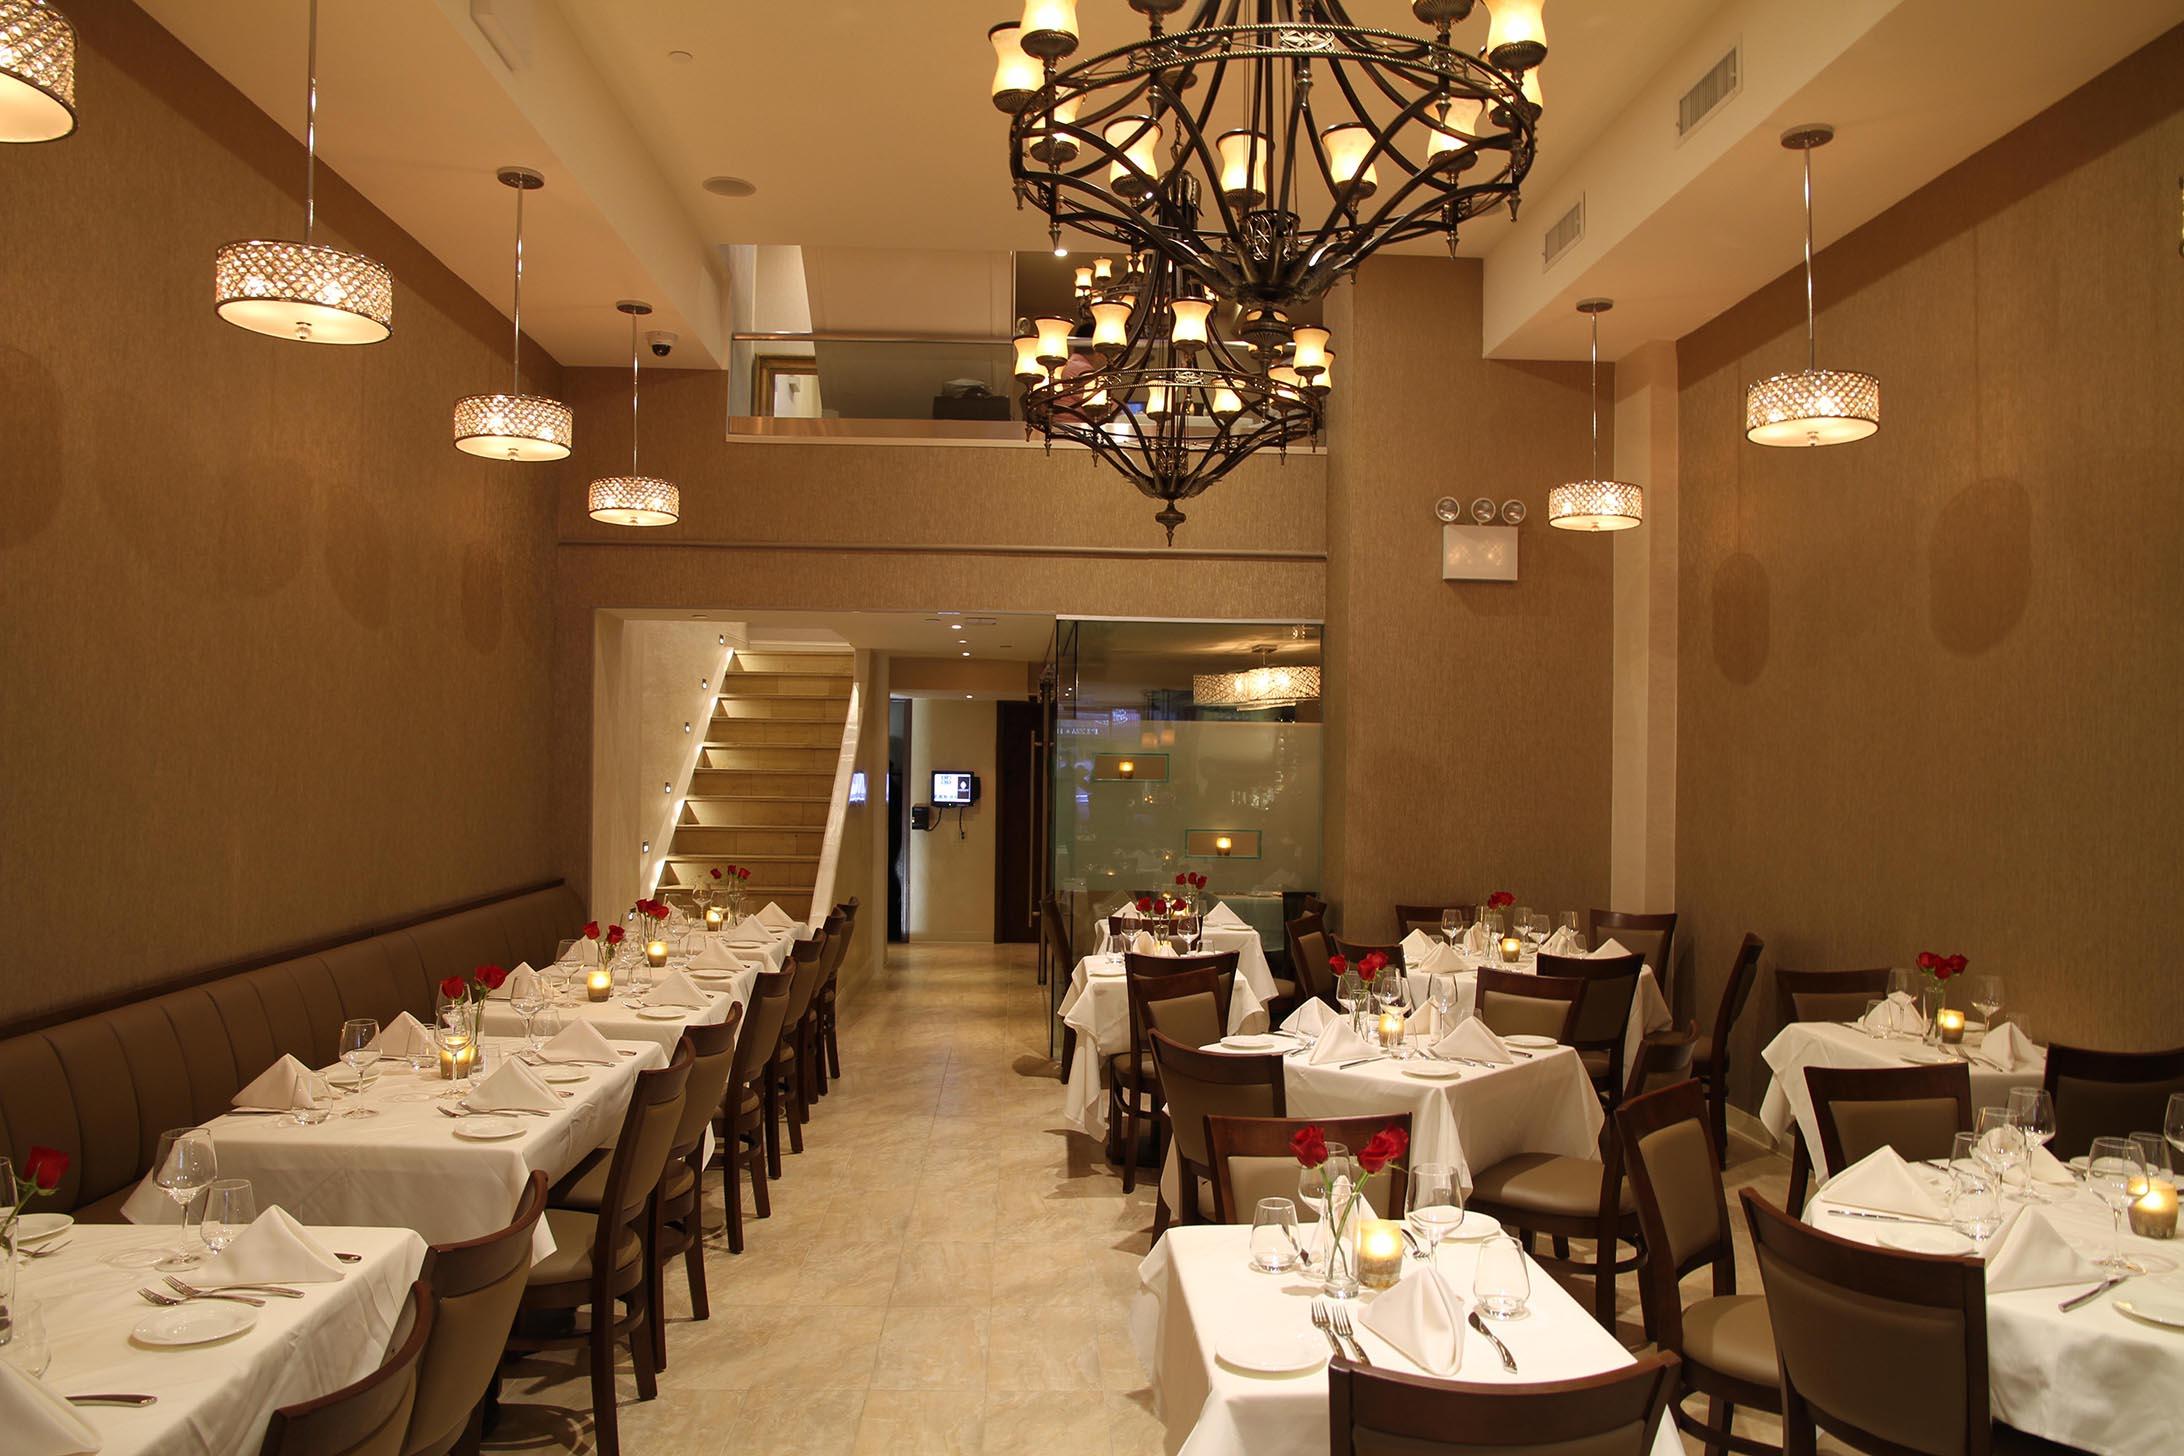 La Brochette Kosher Restaurant What Should We Do